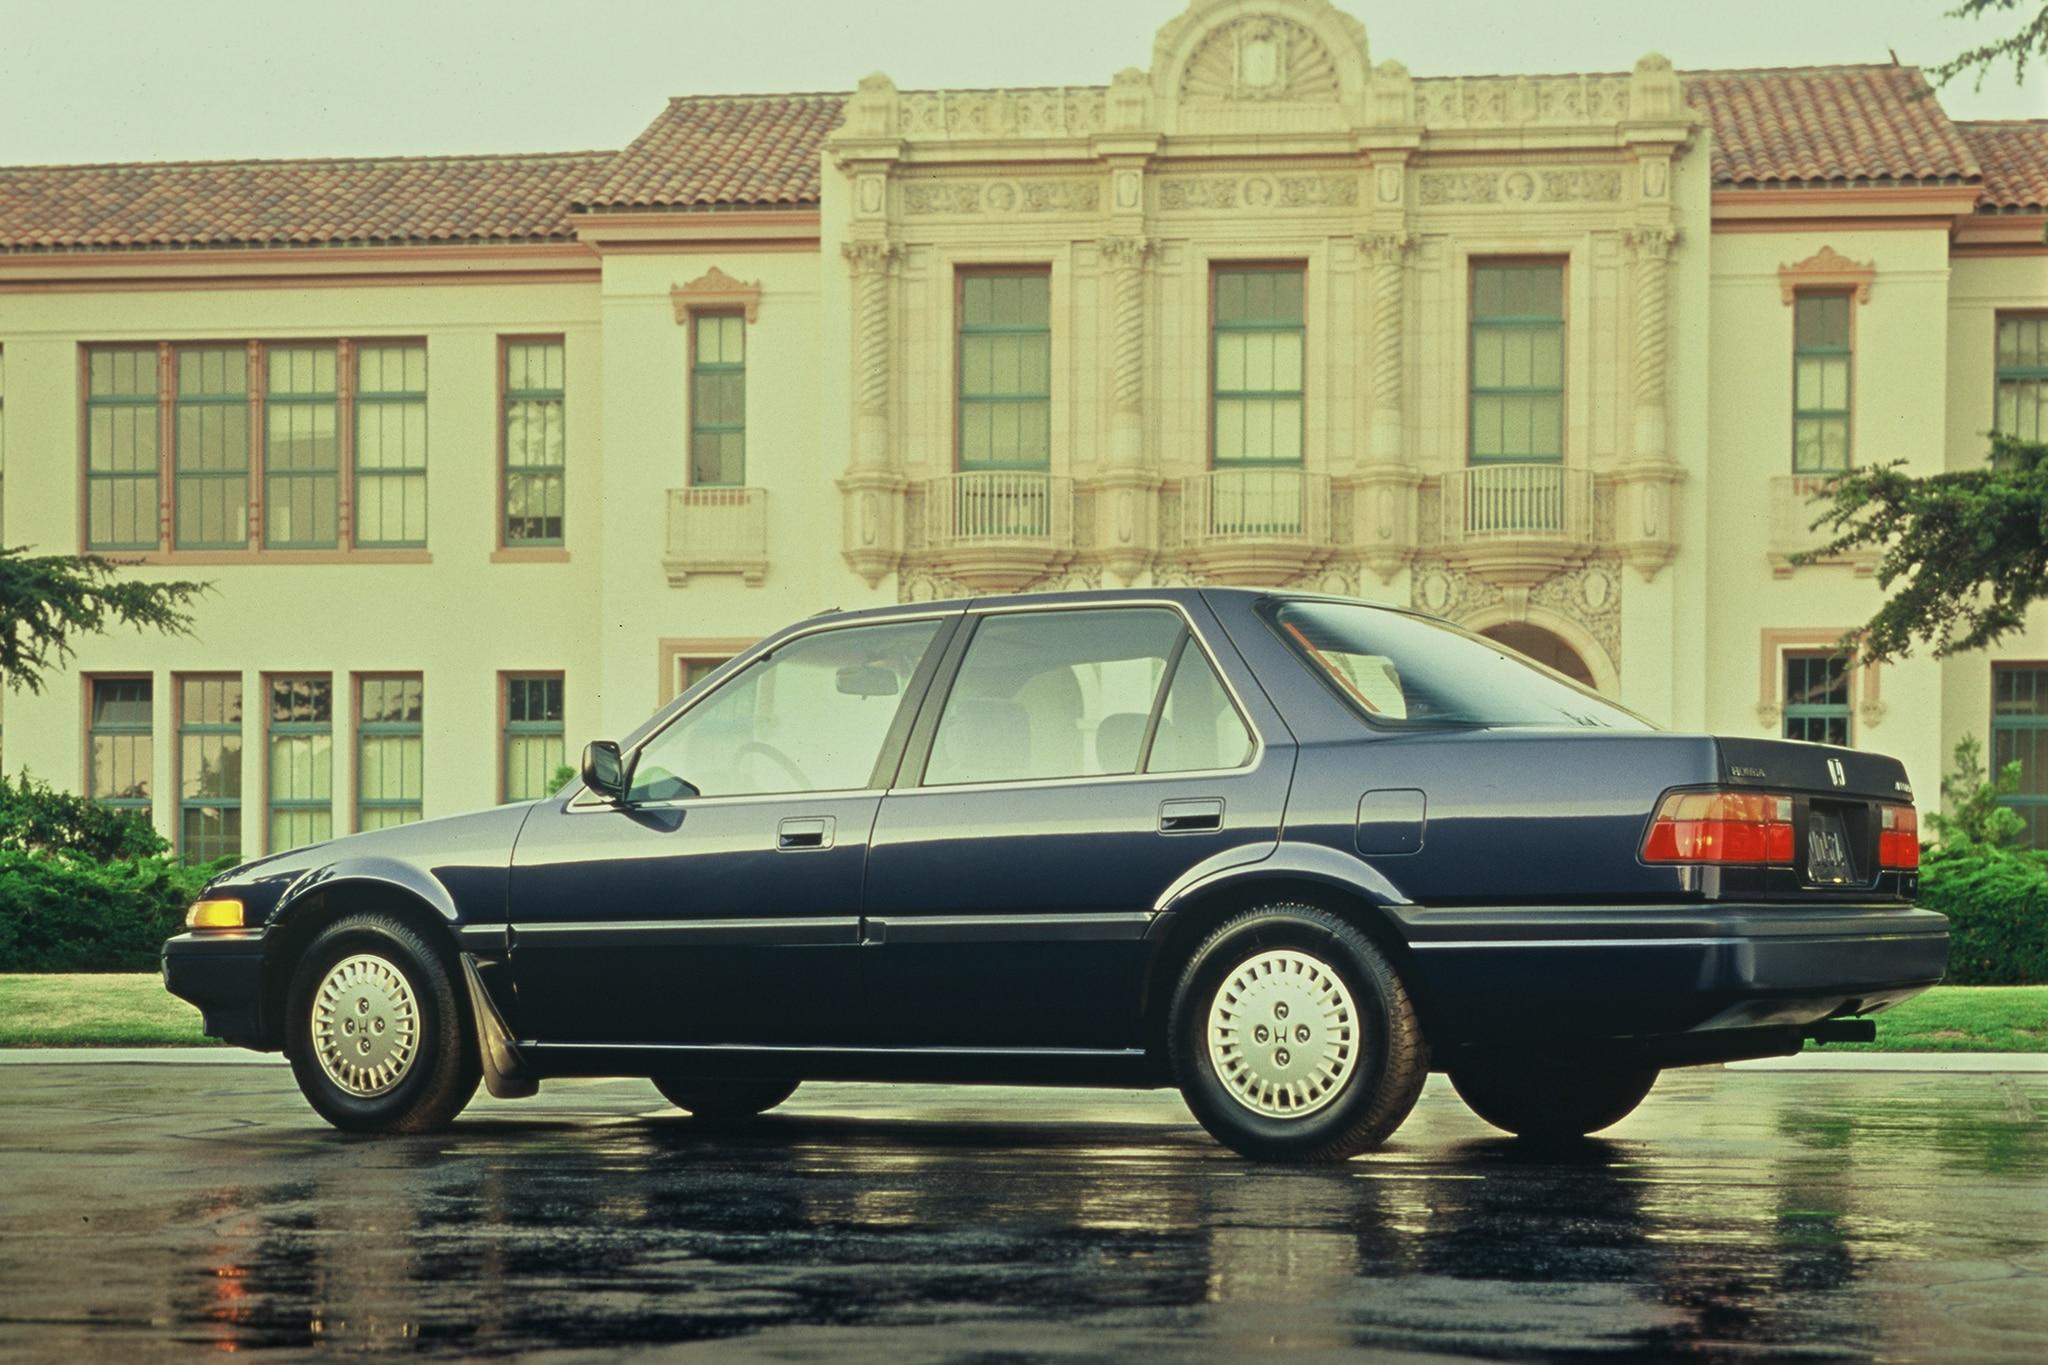 1987 honda accord 3rd generation 02 1 automobile for Honda accord generations